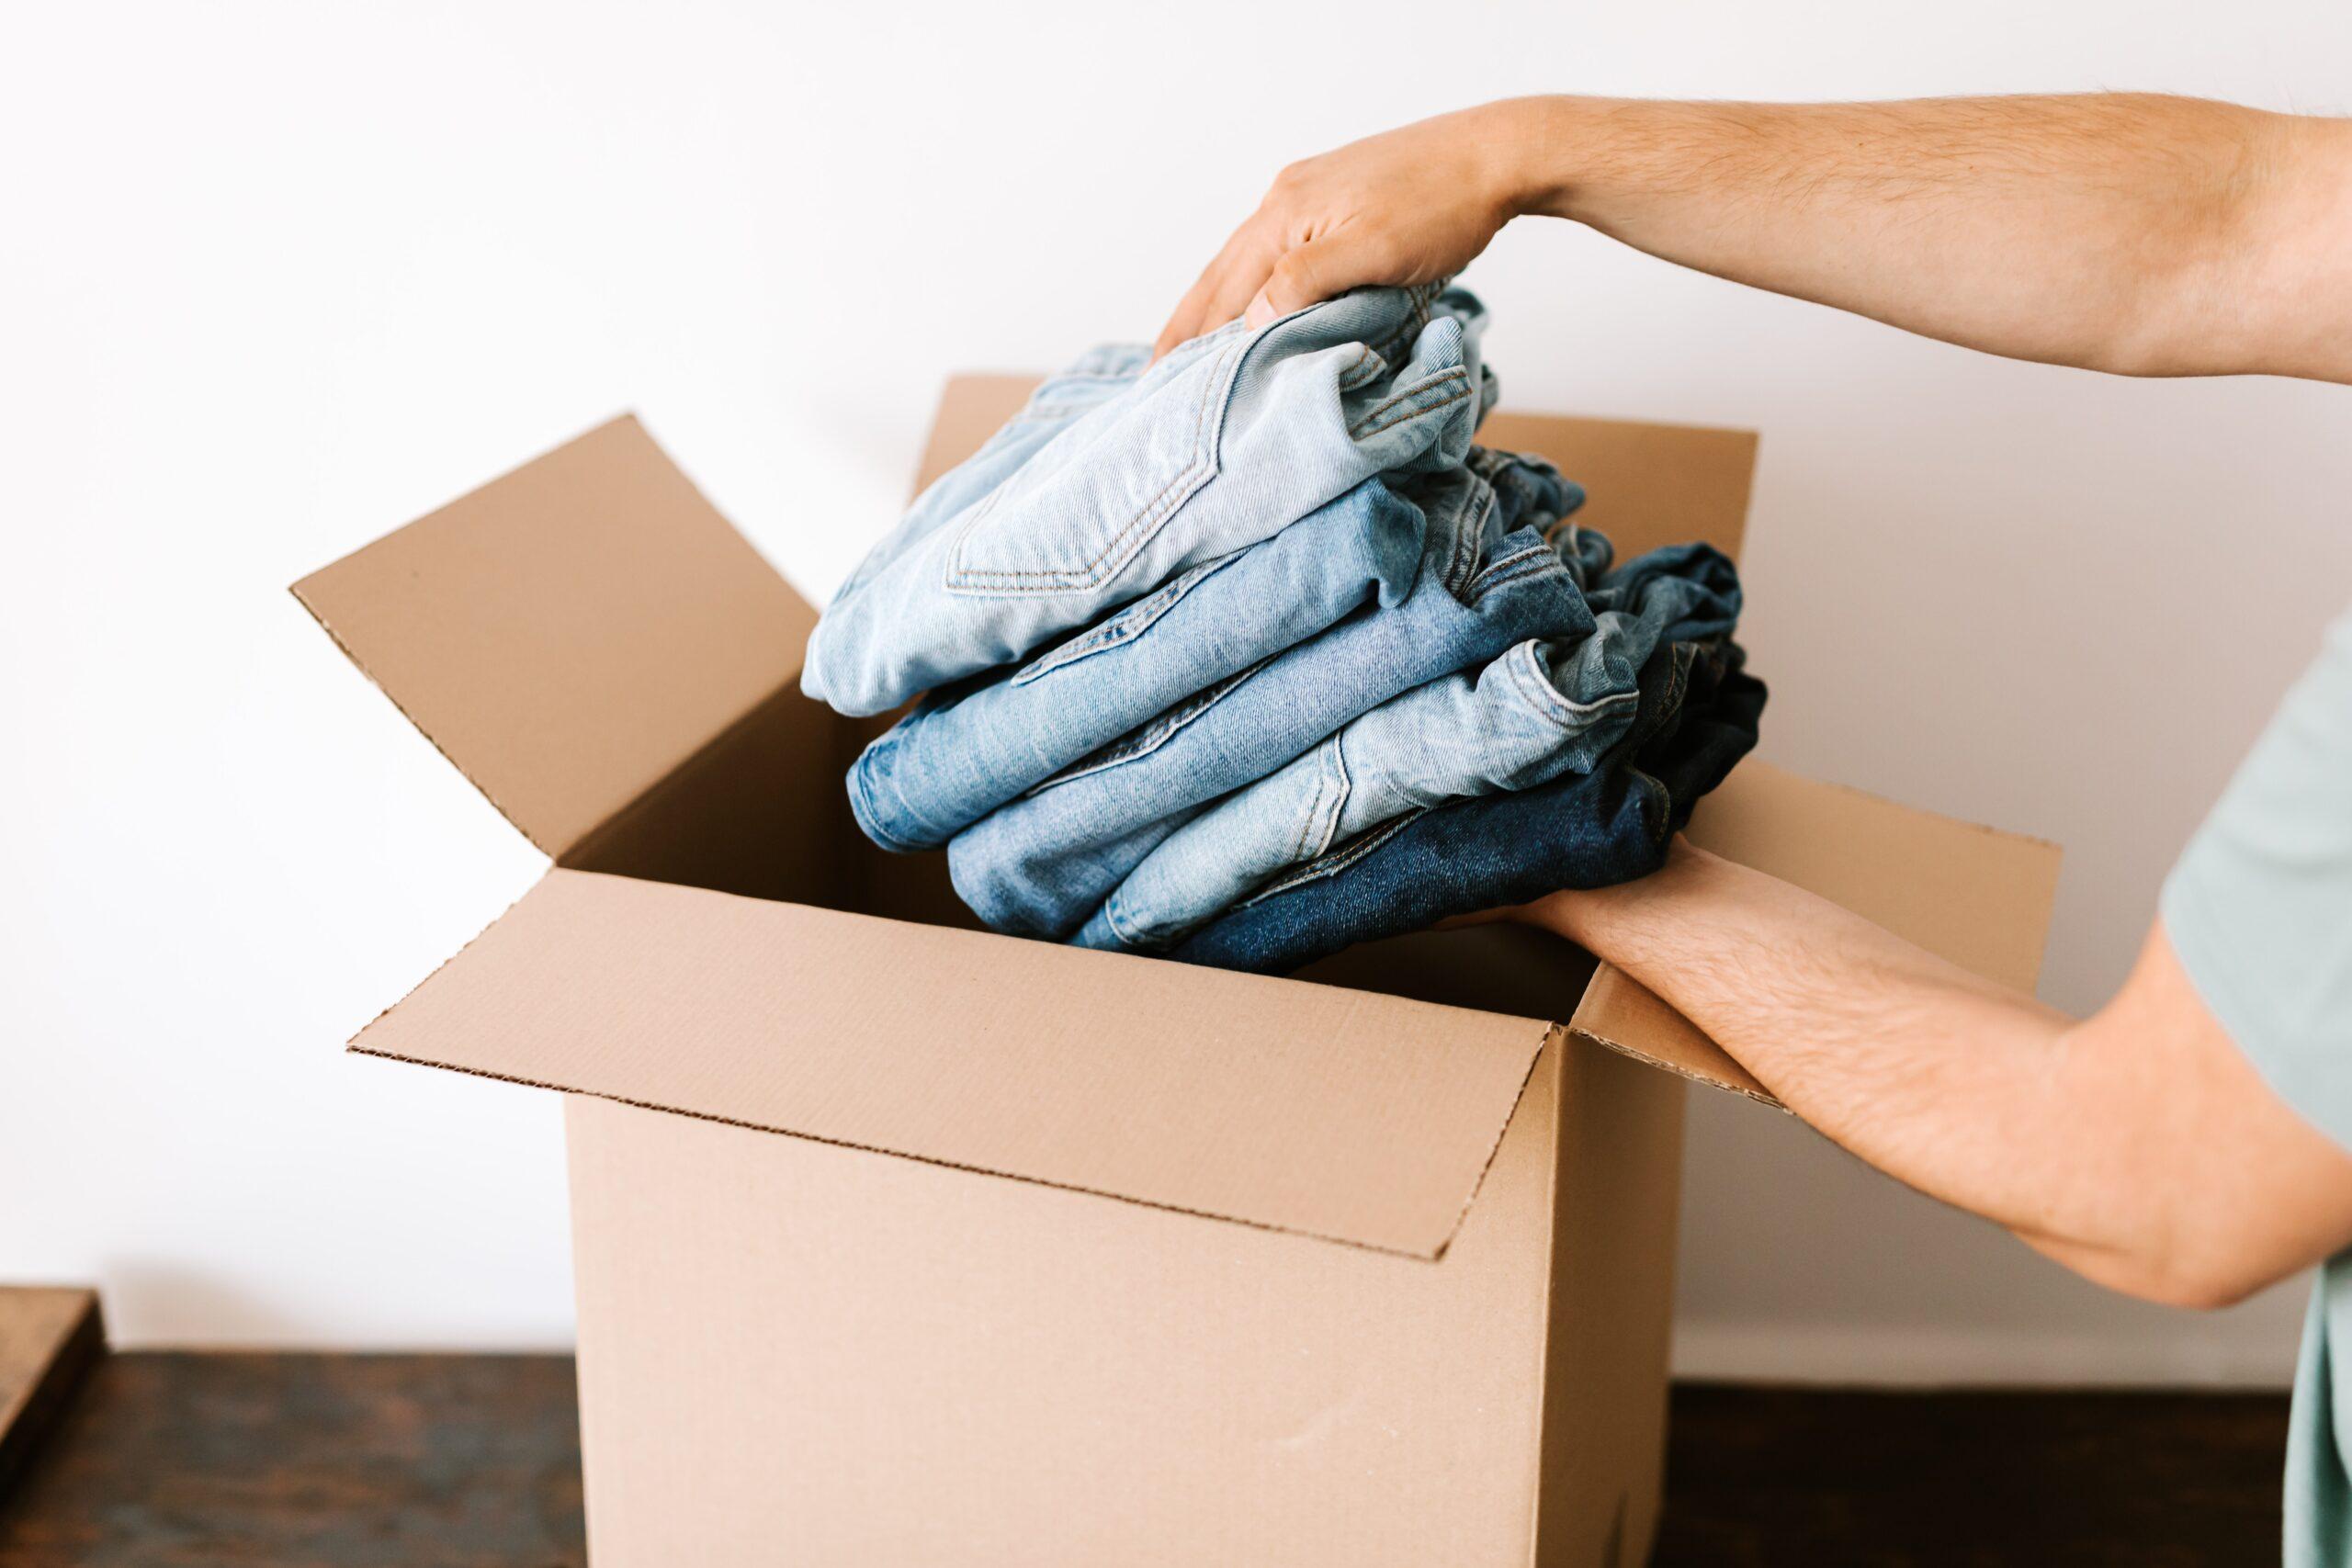 Moving Box Creativity